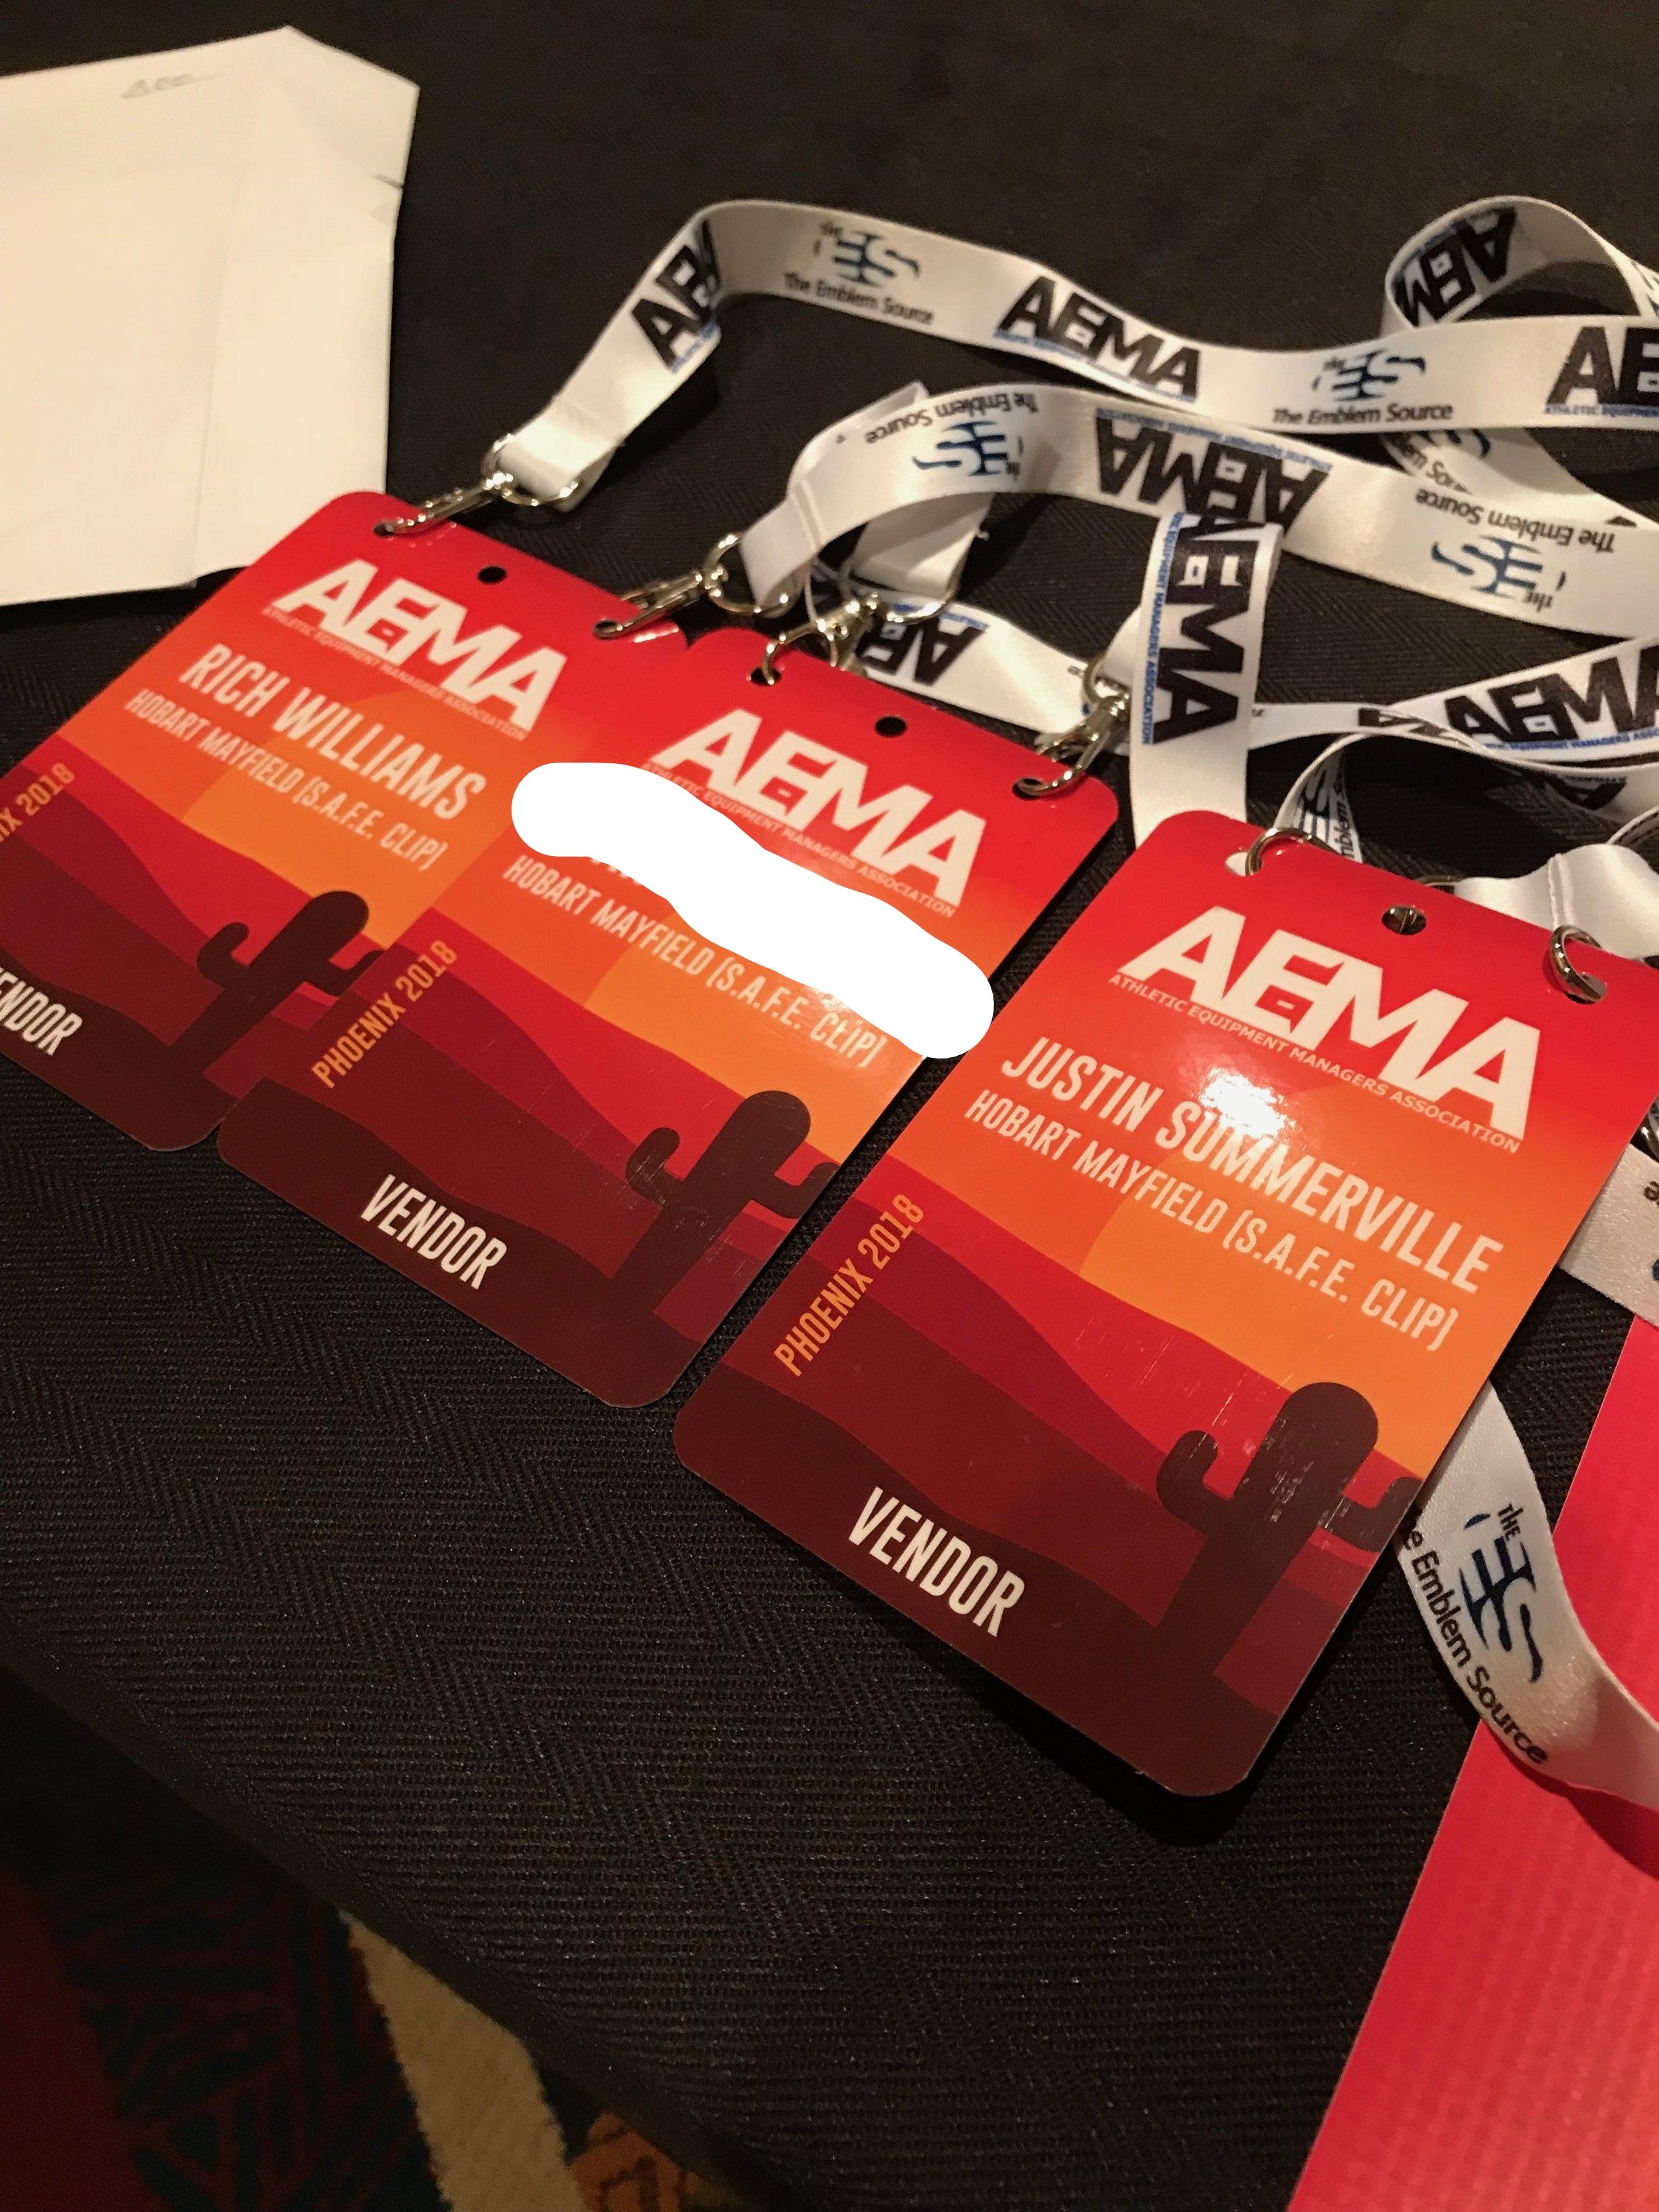 SAFEClip at AEMA convention 2018